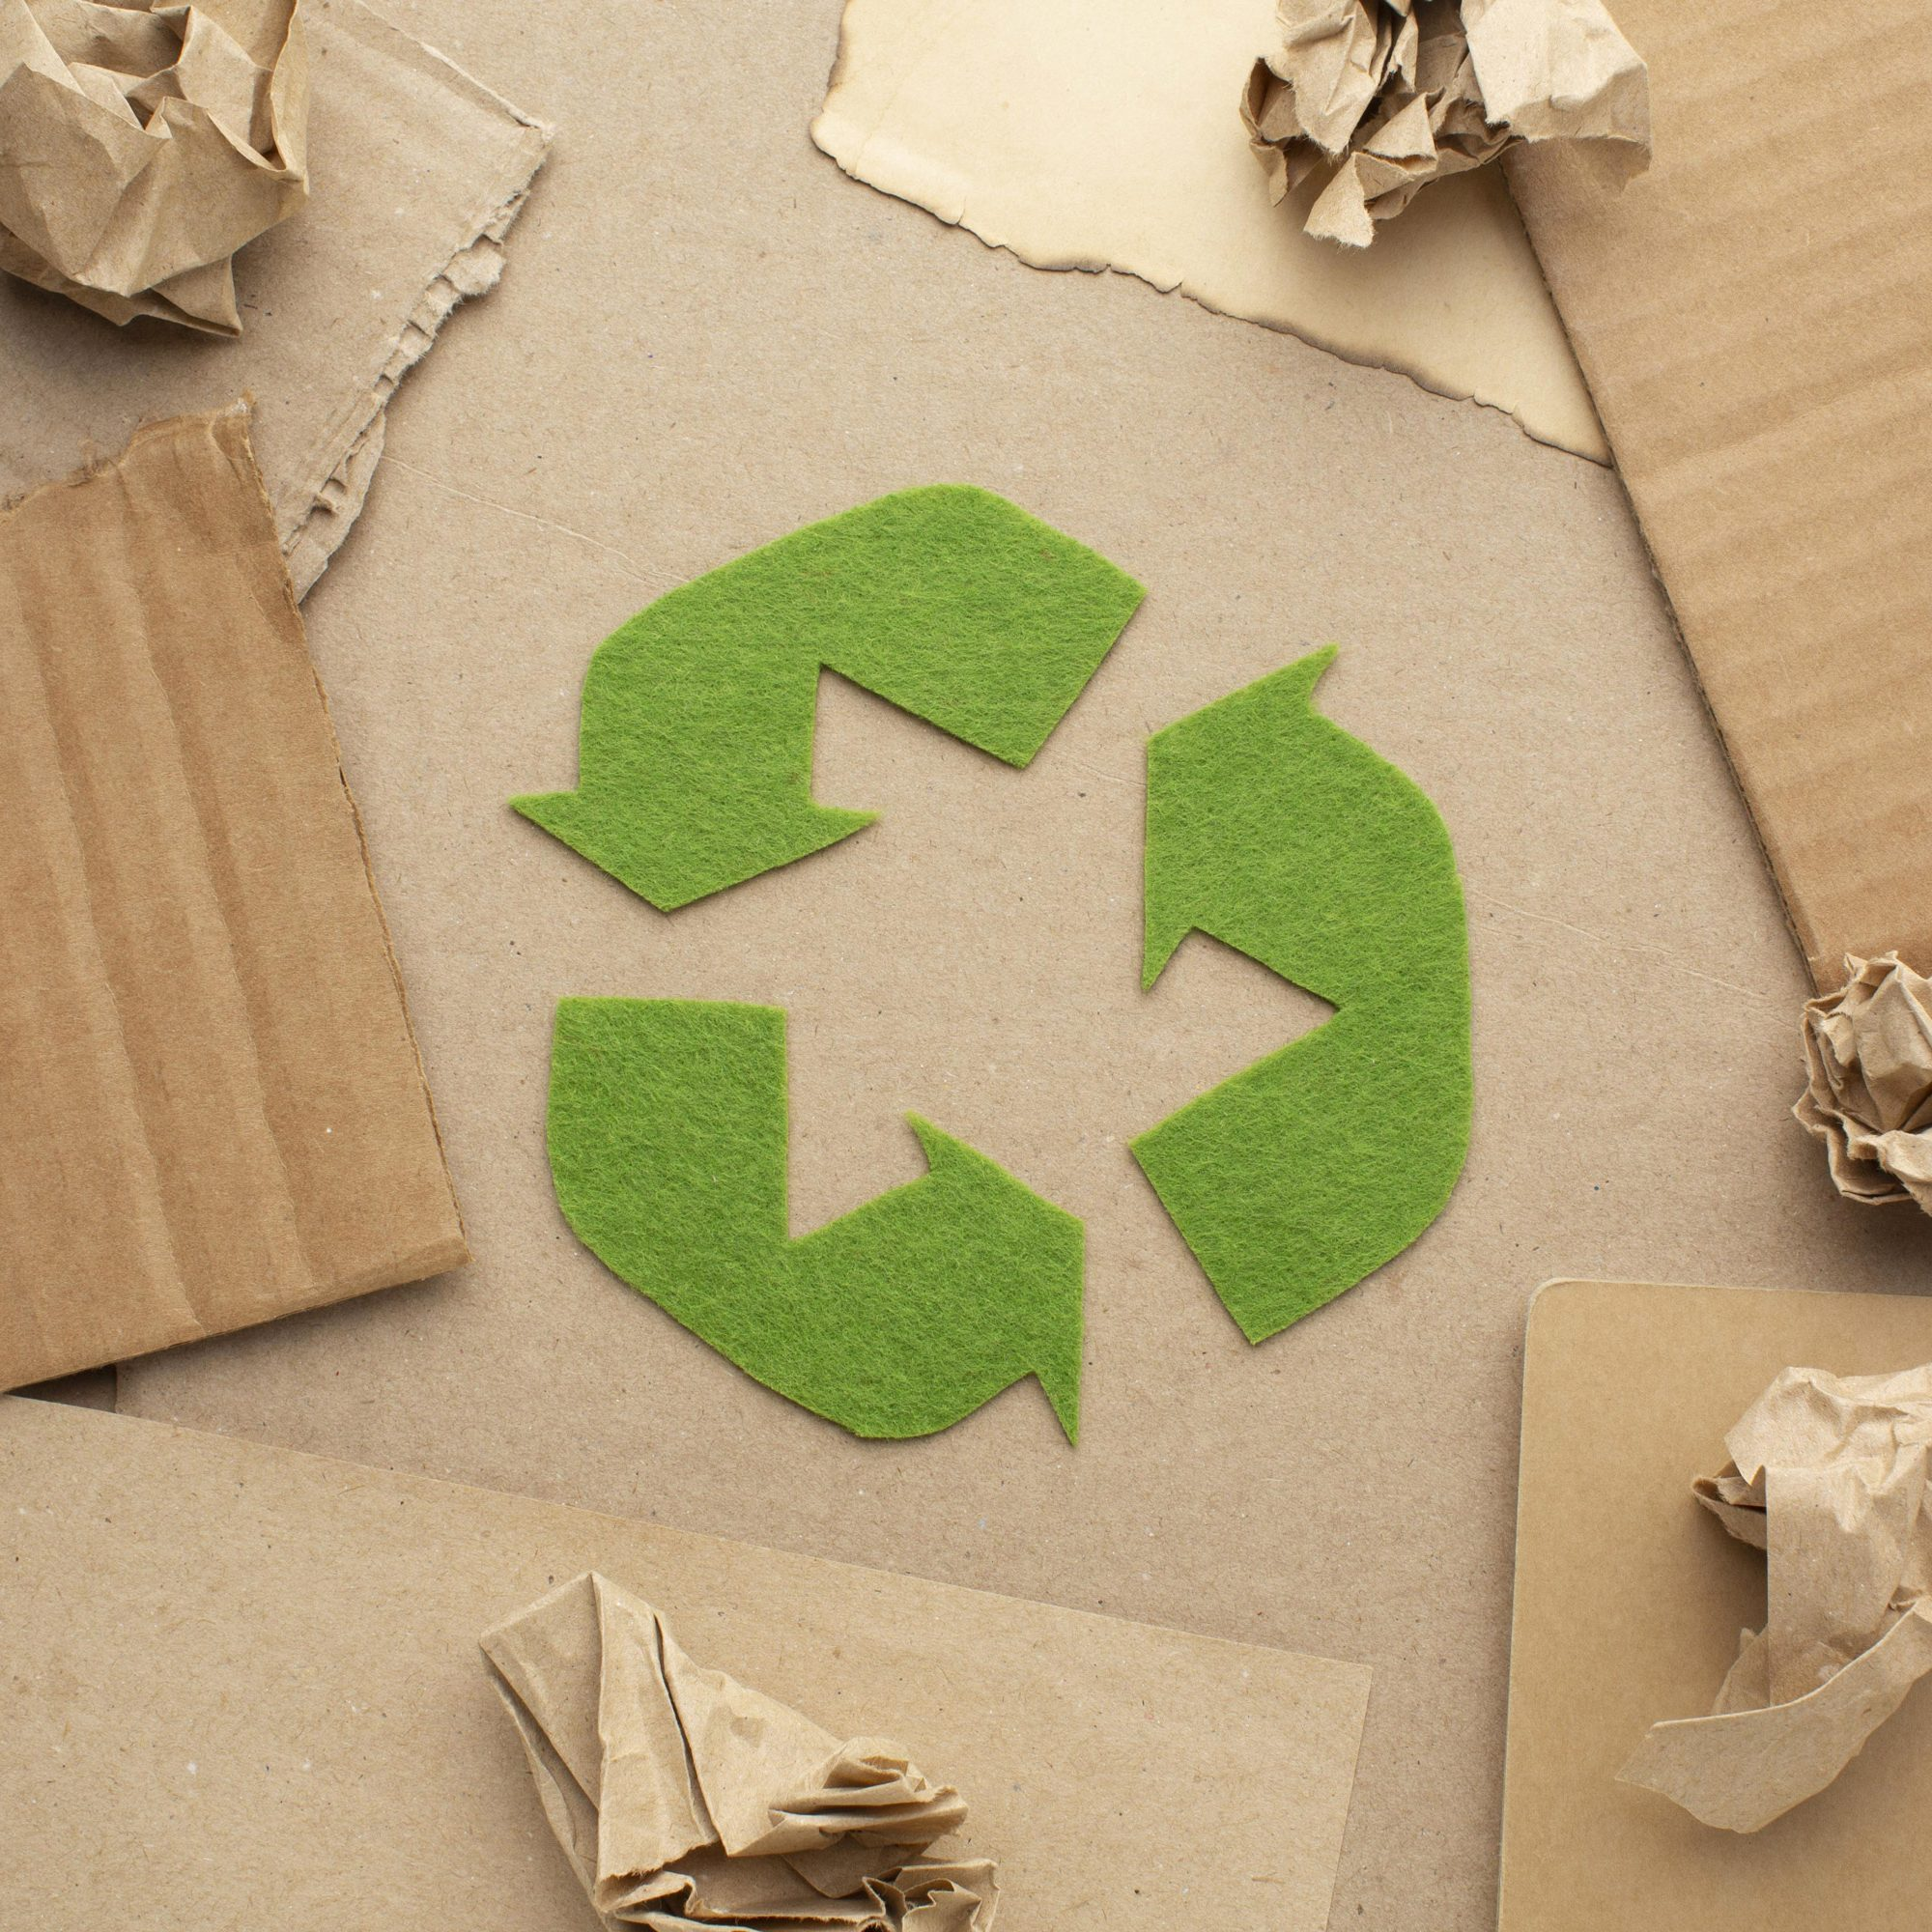 Recyclage_Epilog4